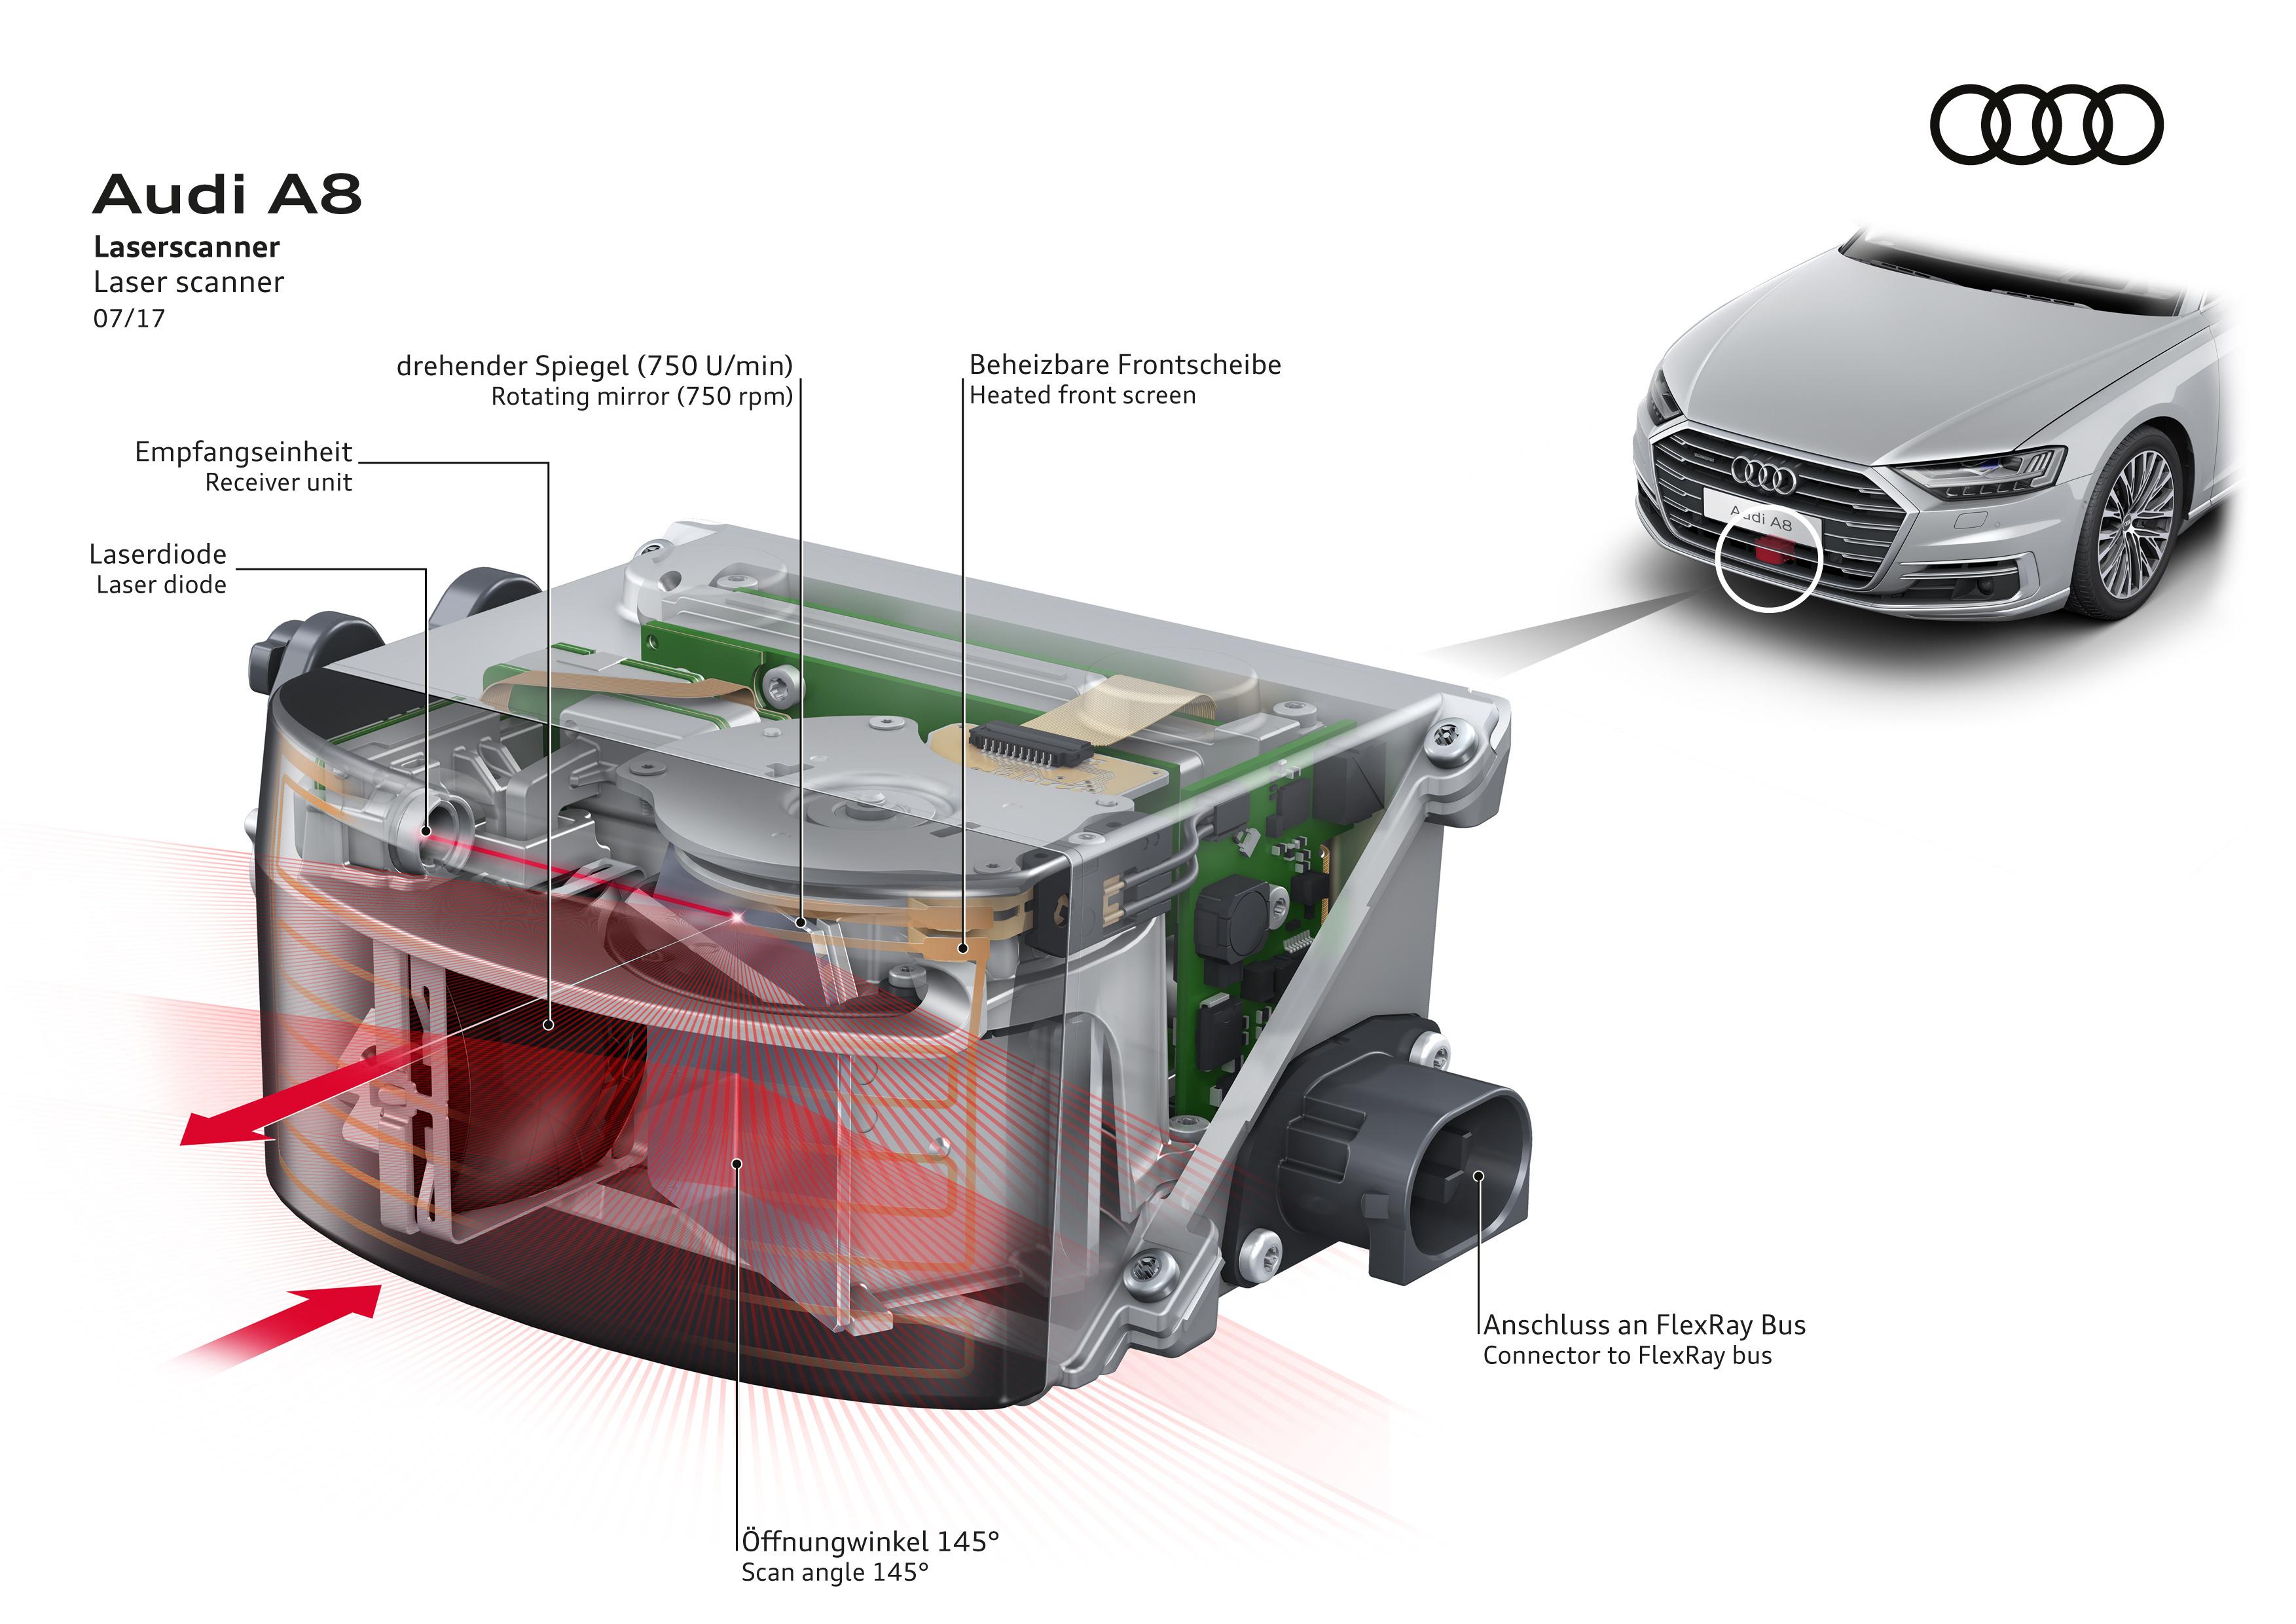 A close-up view of Audi's lidar laser scanner.